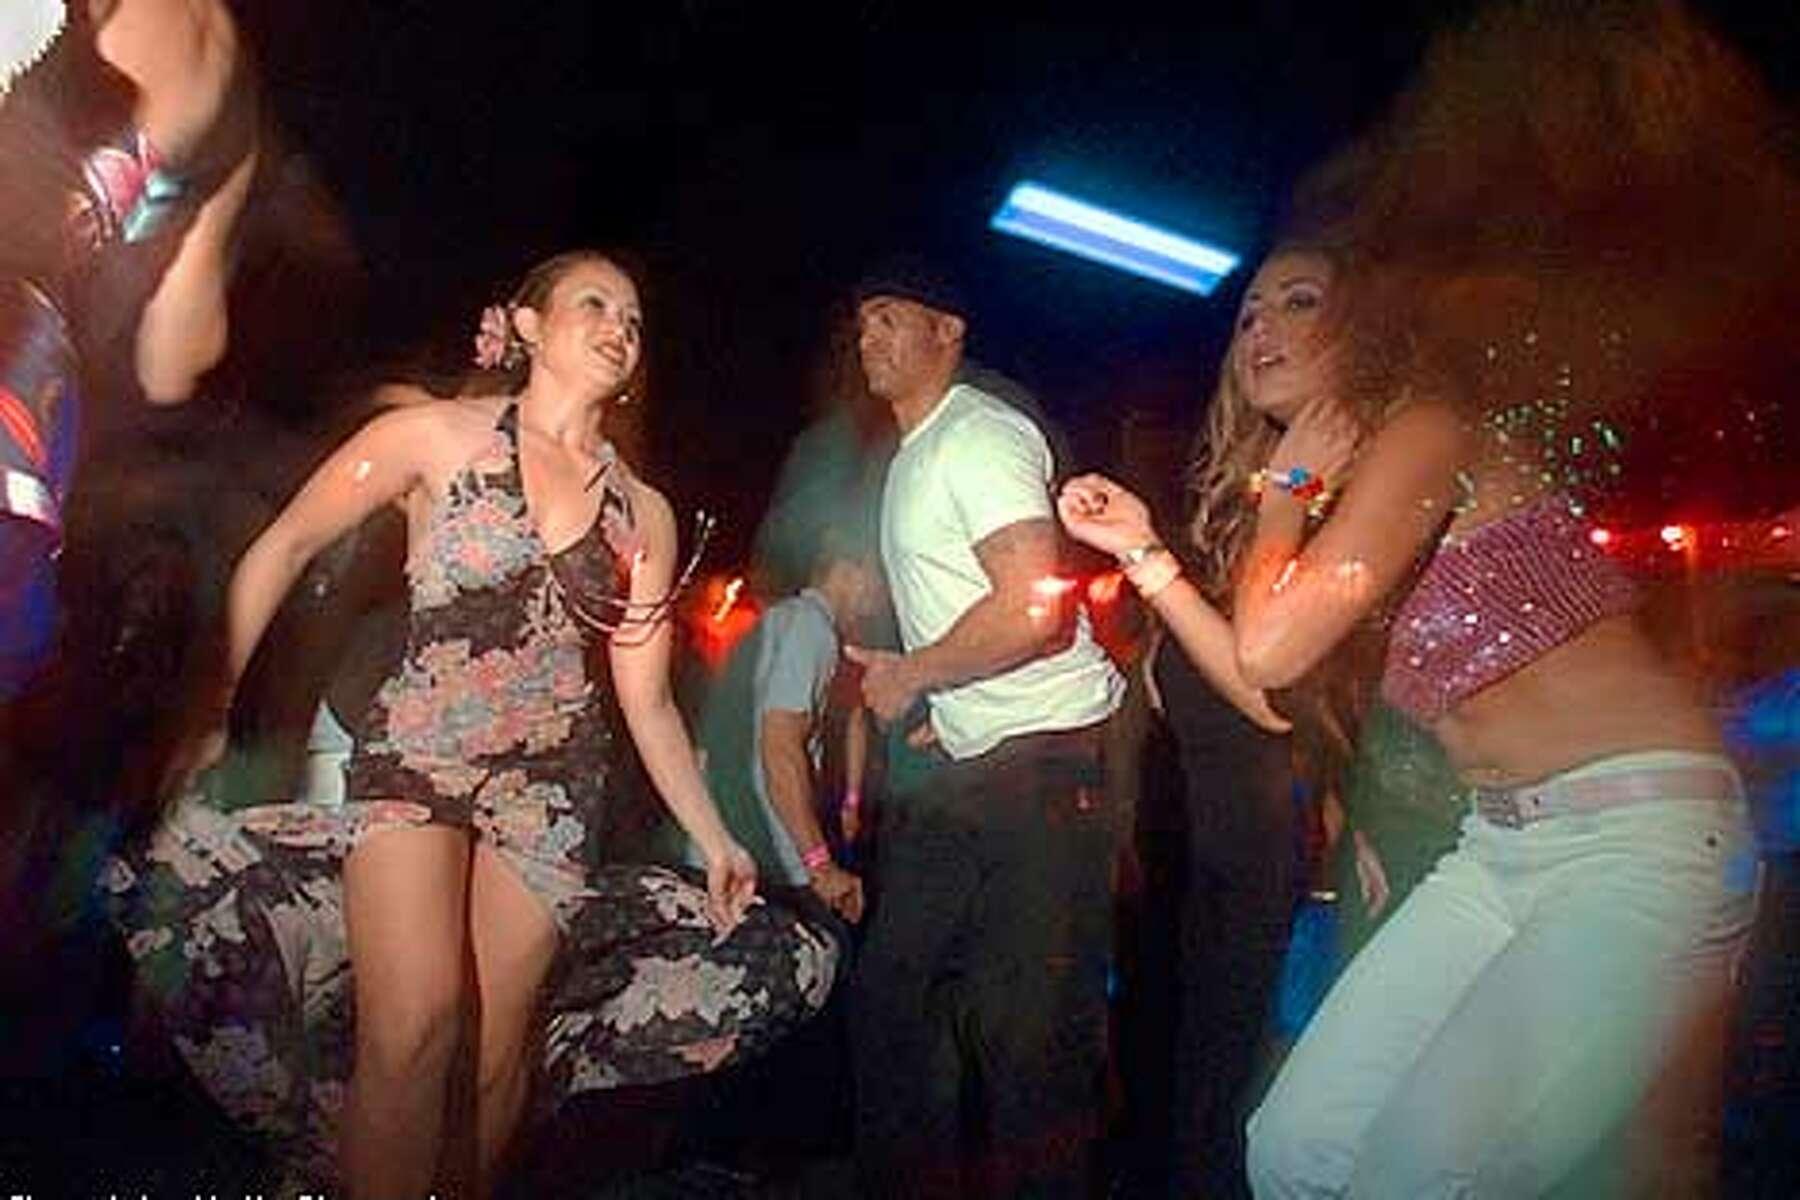 Swinger nude club beach Rooftop Resort